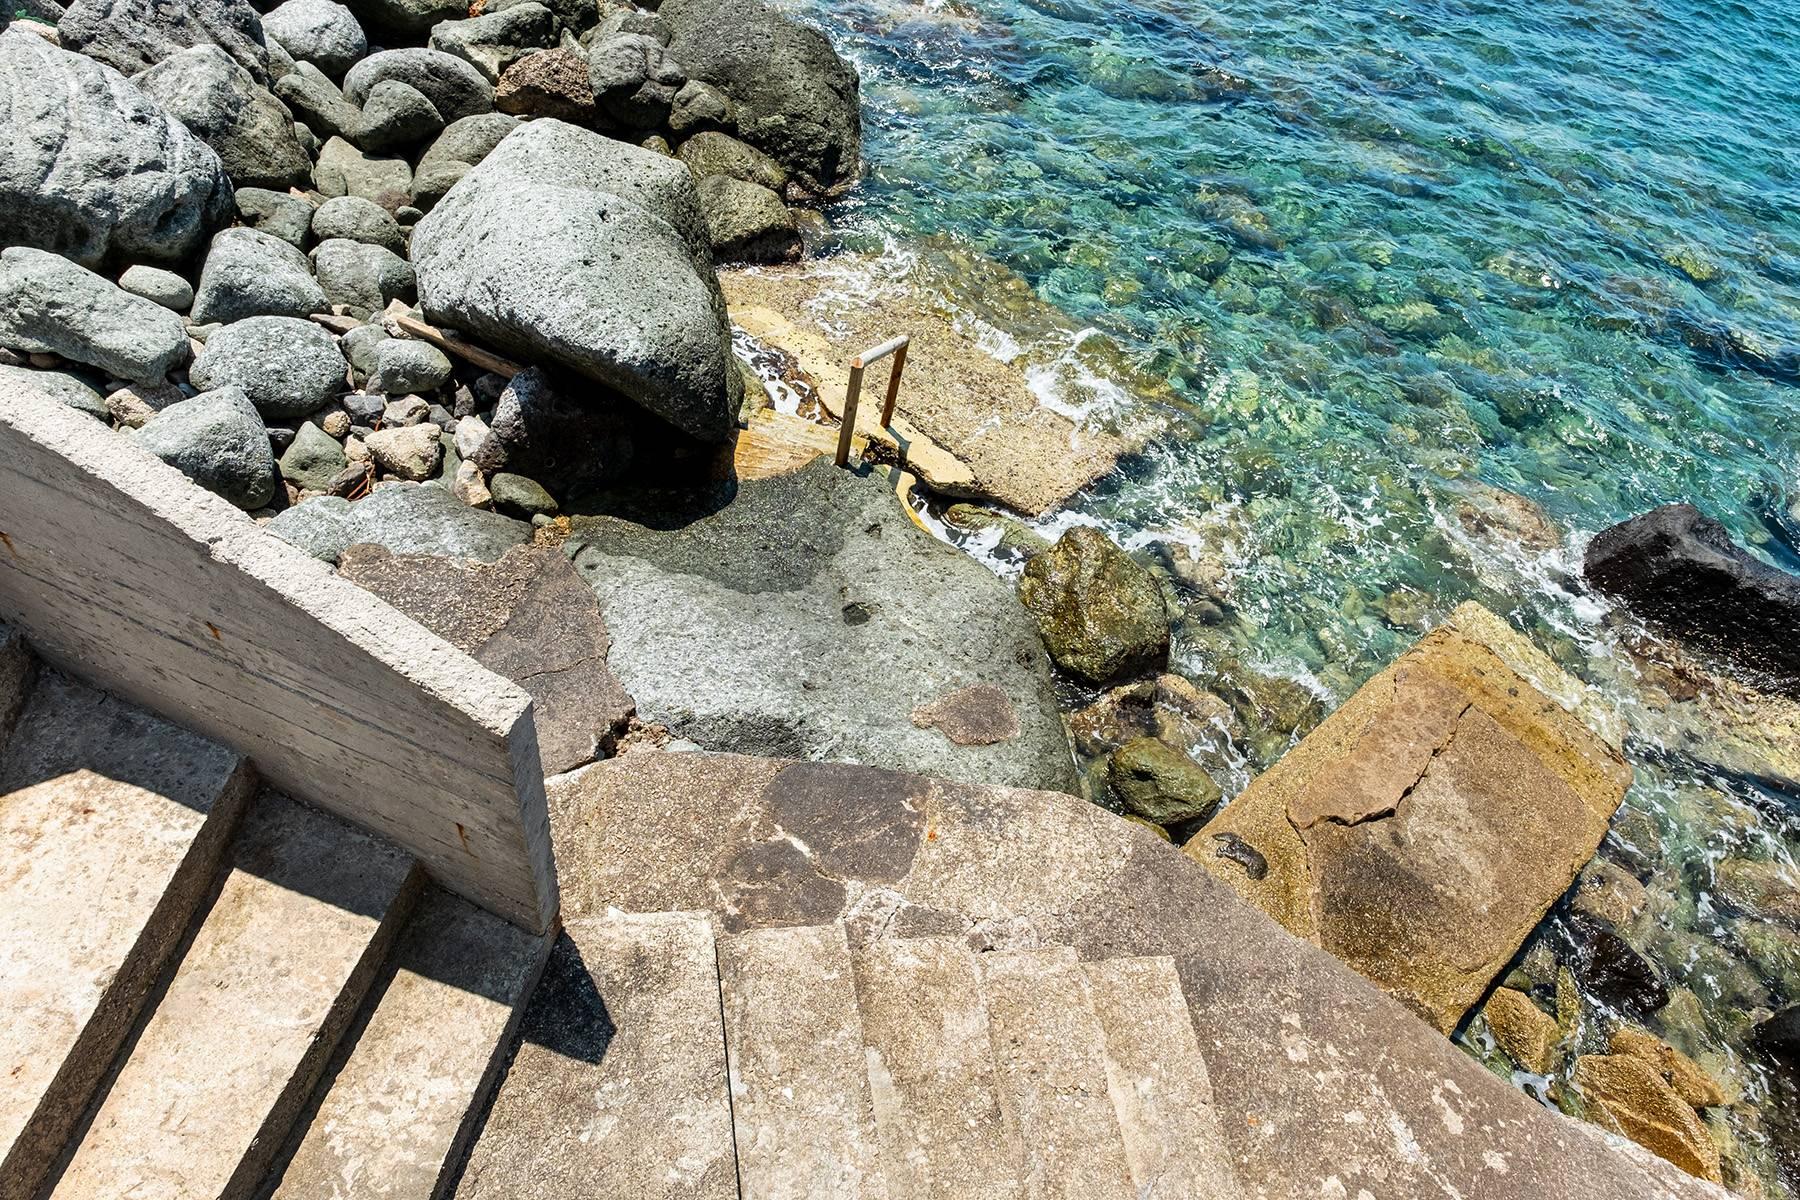 Villa in Vendita a Ischia: 5 locali, 400 mq - Foto 13